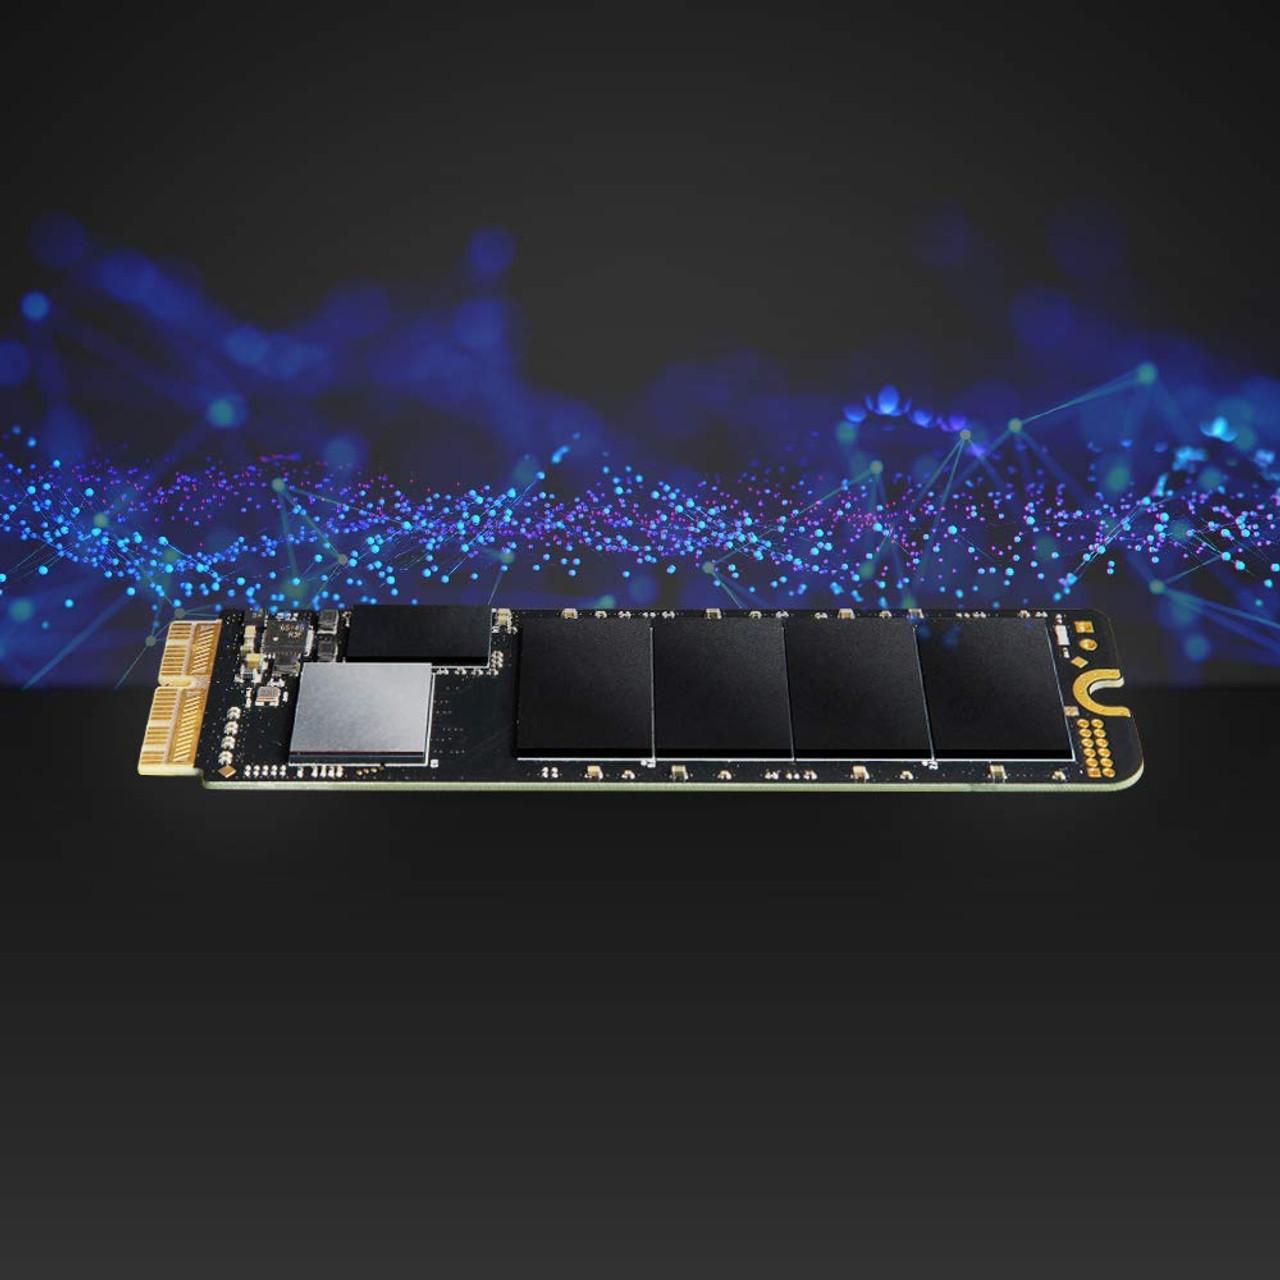 Transcend Jetdrive 855, 240GB SSD Upgrade Kit for MacBook Air Mid 2013 - 2017,MacBook Pro (Retina) Late 2013 - Mid 2015, Mac mini Late 2014 and Mac Pro Late 2013